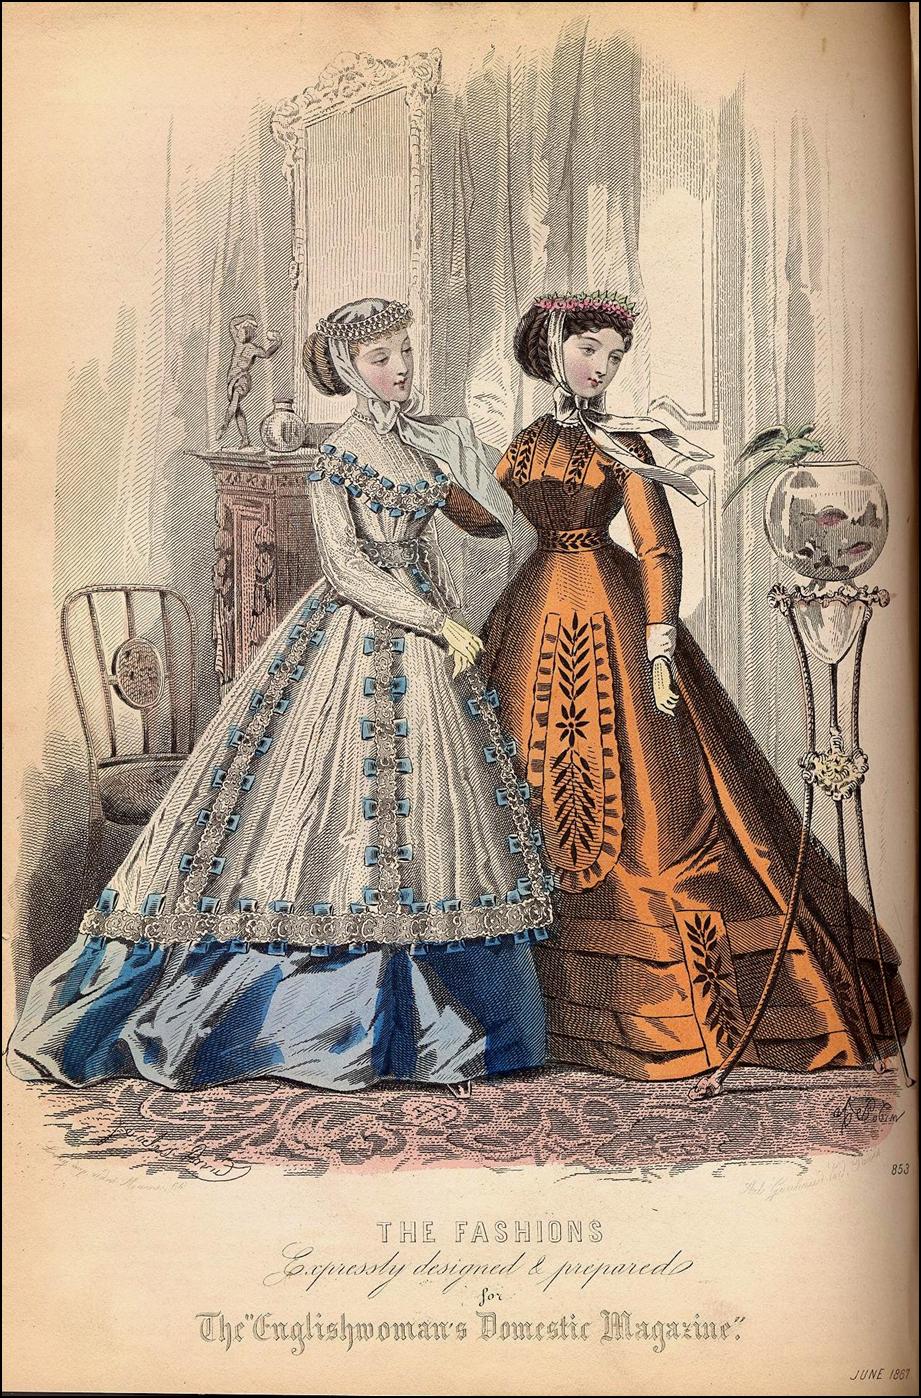 English Woman's Domestic Magazine, June 1867.